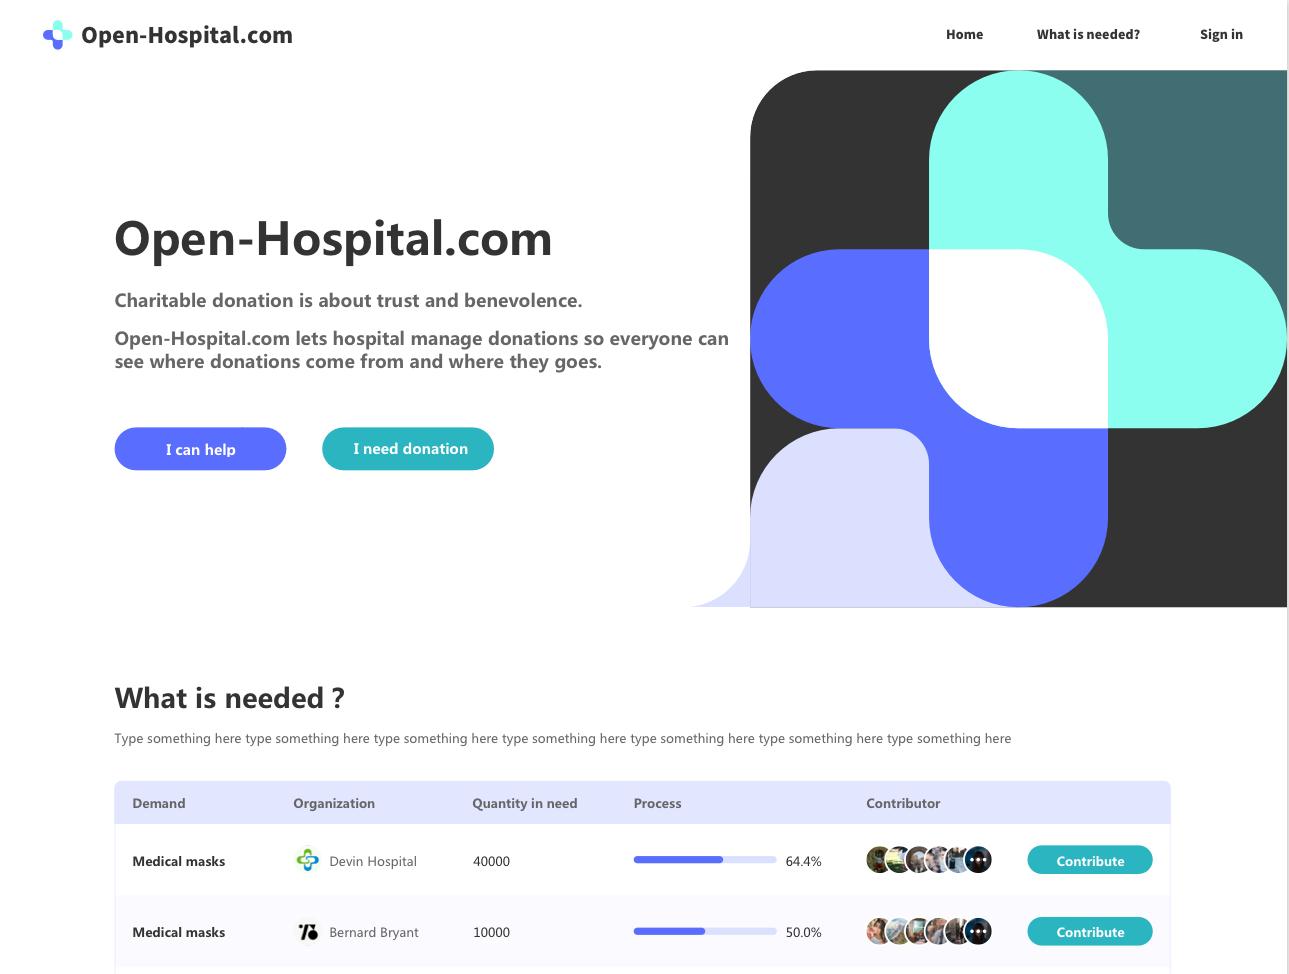 OpenHospital: Online hub for medical equipment fundraisers